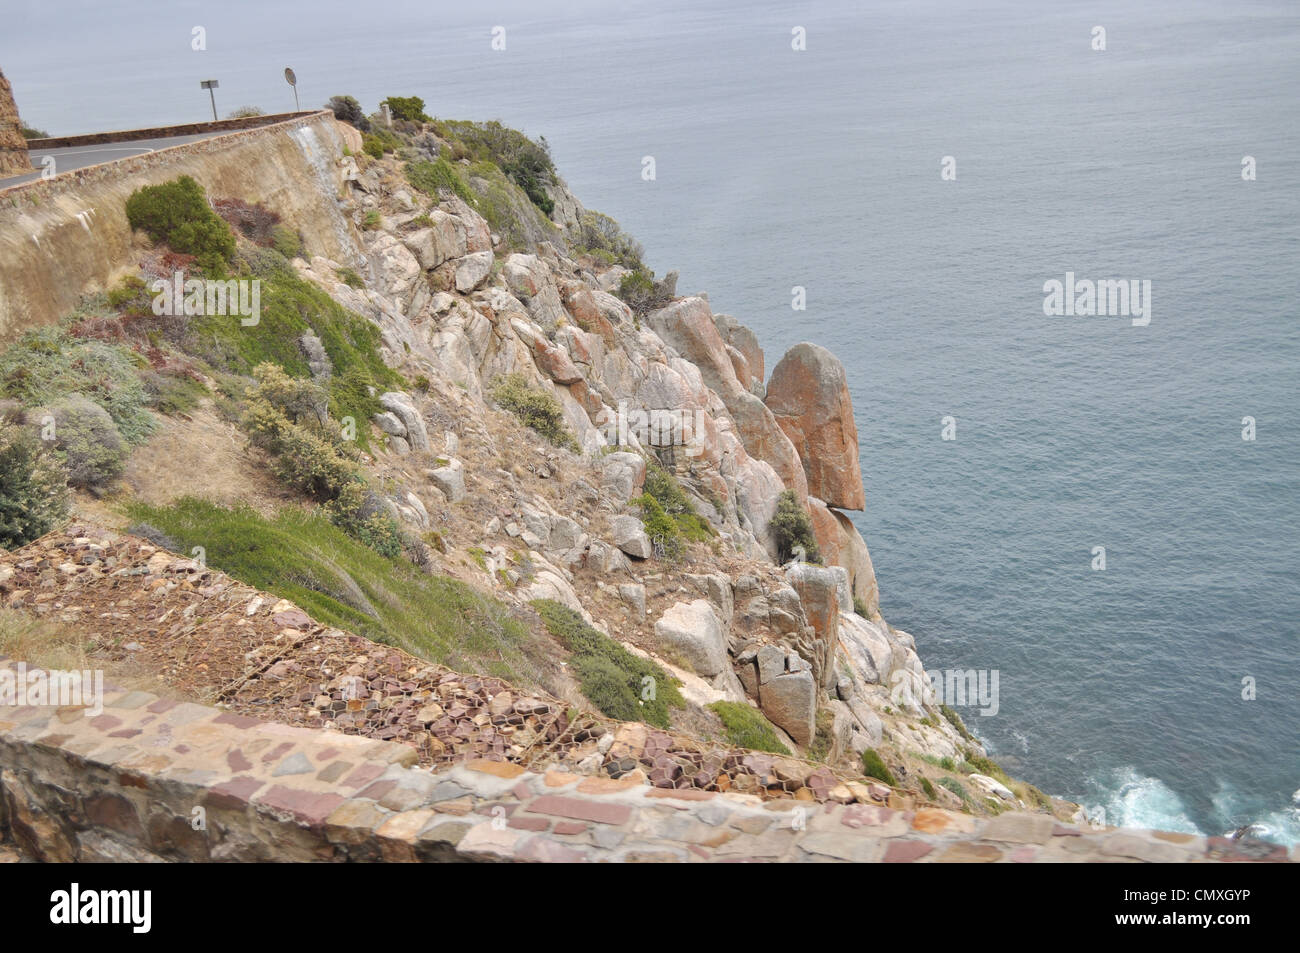 Boulders along capetown southafrica coasline Stock Photo